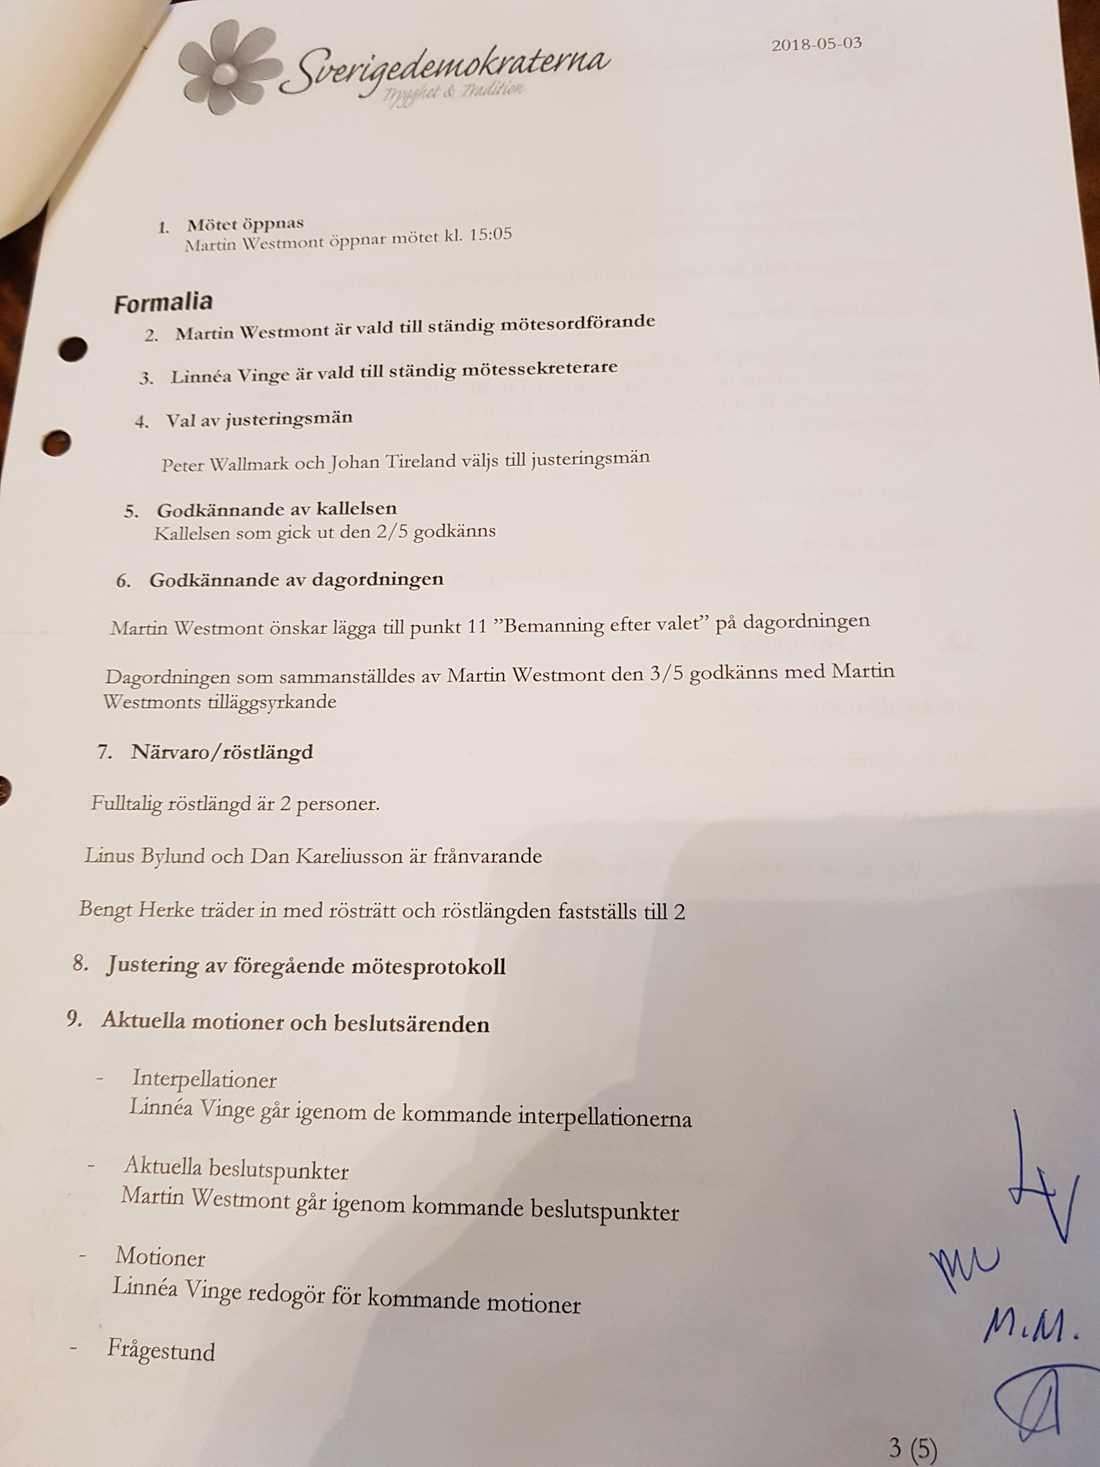 Protokollet som blivit centralt i den politiska maktstriden i SD Stockholm